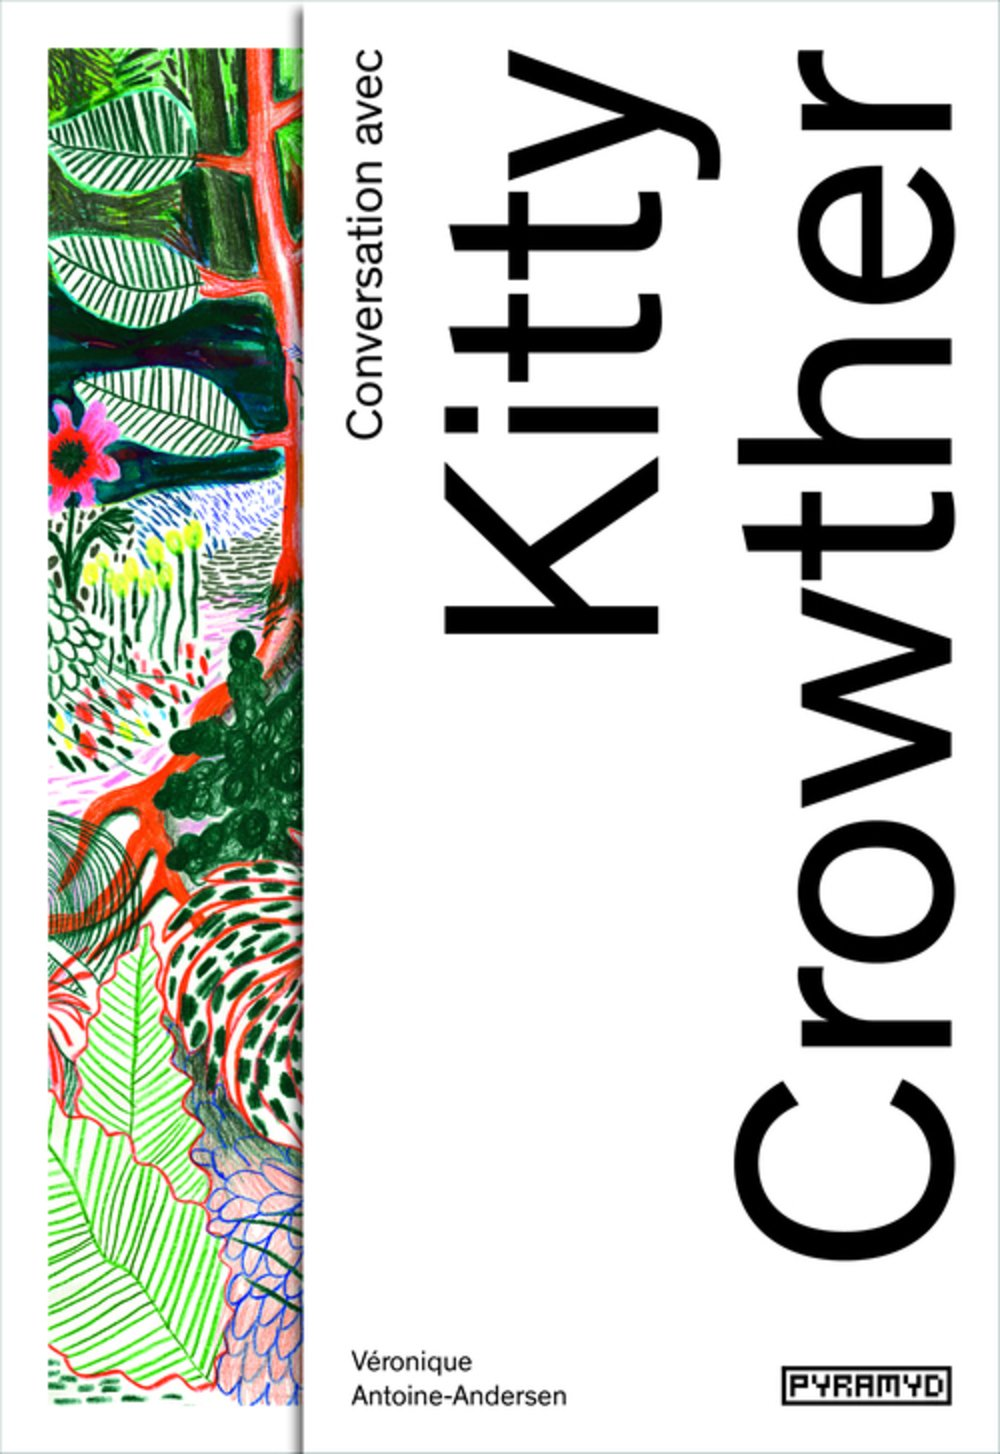 Conversation avec... Kitty Crowther Broché – 27 octobre 2016 Veronique Antoine-andersen Pyramyd 2350173755 Arts graphiques (dessin